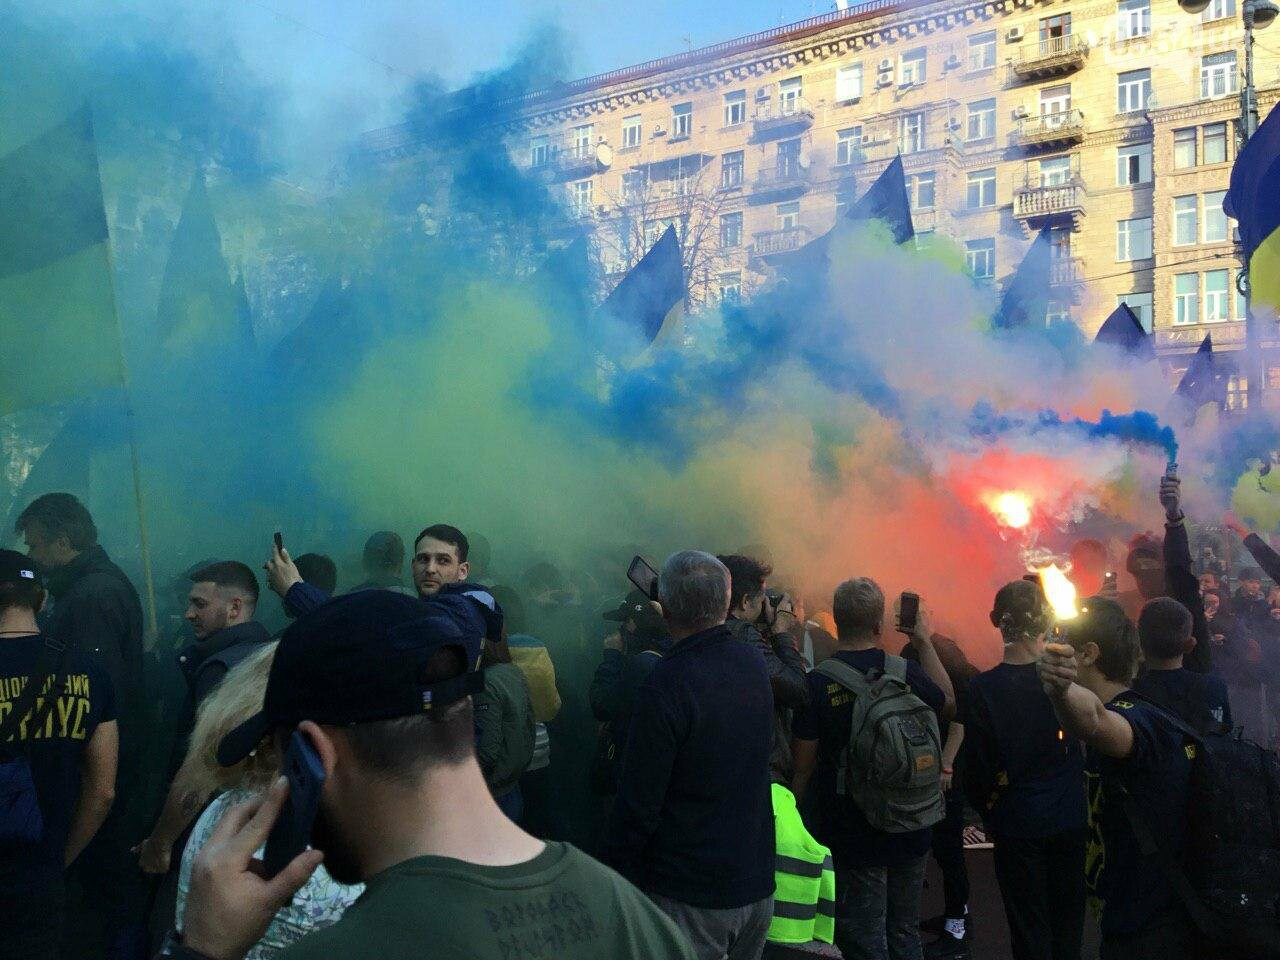 Криворожане поддержали Марш сопротивления капитуляции в Киеве, - ФОТО, ВИДЕО, ОБНОВЛЕНО, фото-17